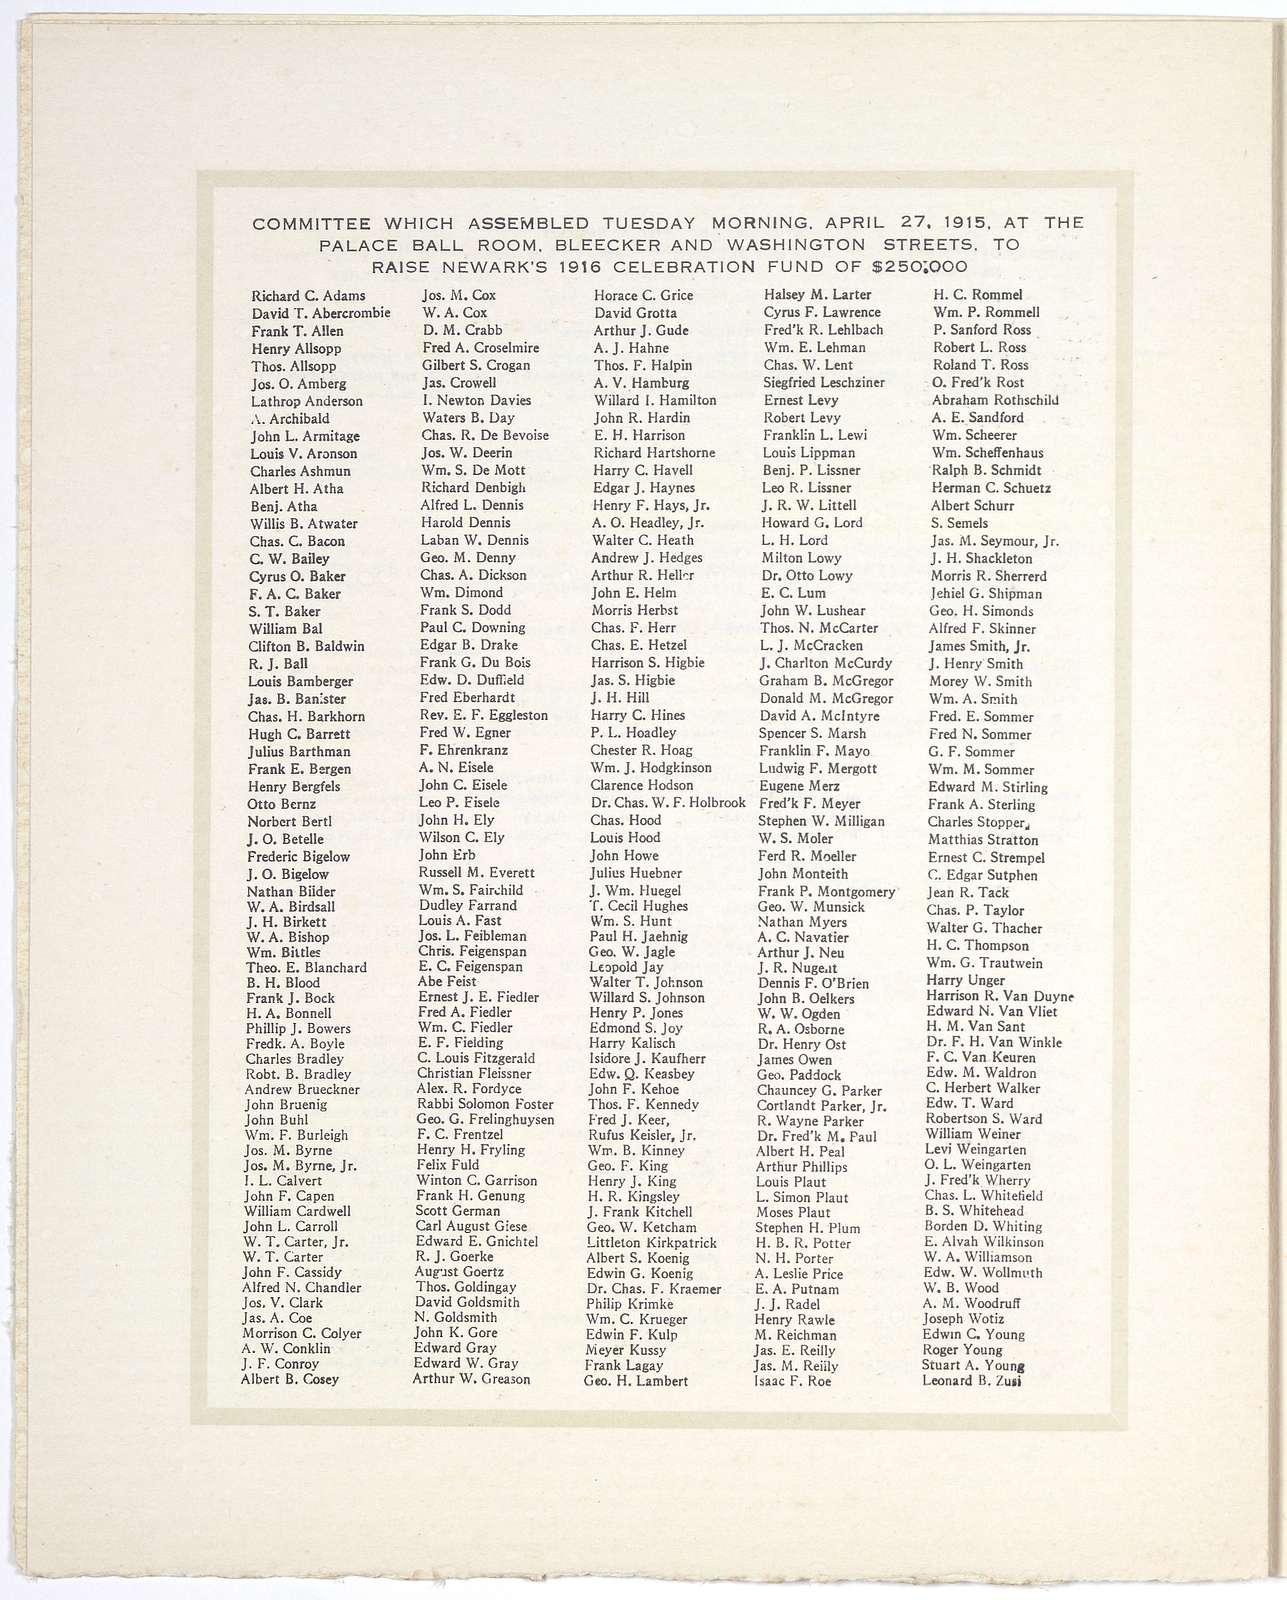 1666 - 1916. [Robert Treat directing landing of founders of Newark (by) Adolph Treidler] 250th anniversary celebration ... Newark's $1000 prize poster. Newark, N. J. 1916.